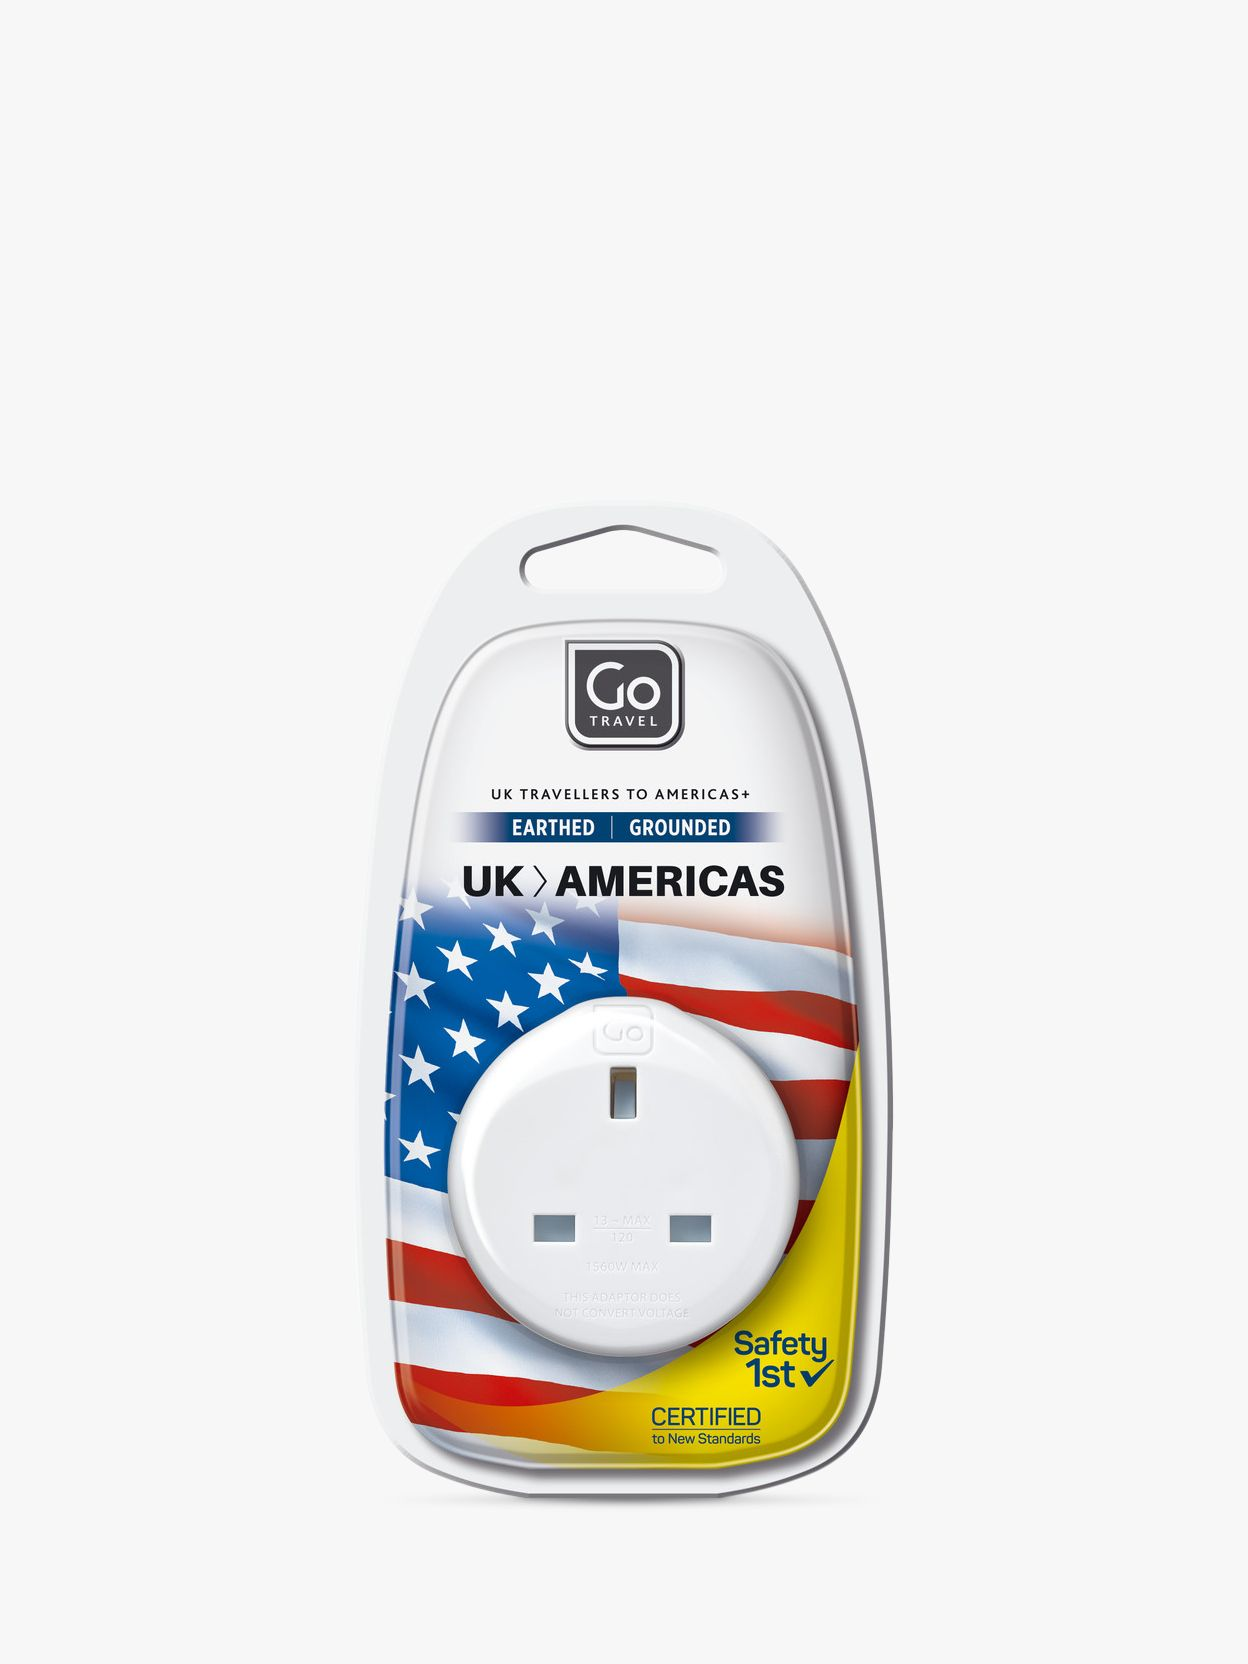 Go Travel Go Travel UK to USA Plug Adaptor